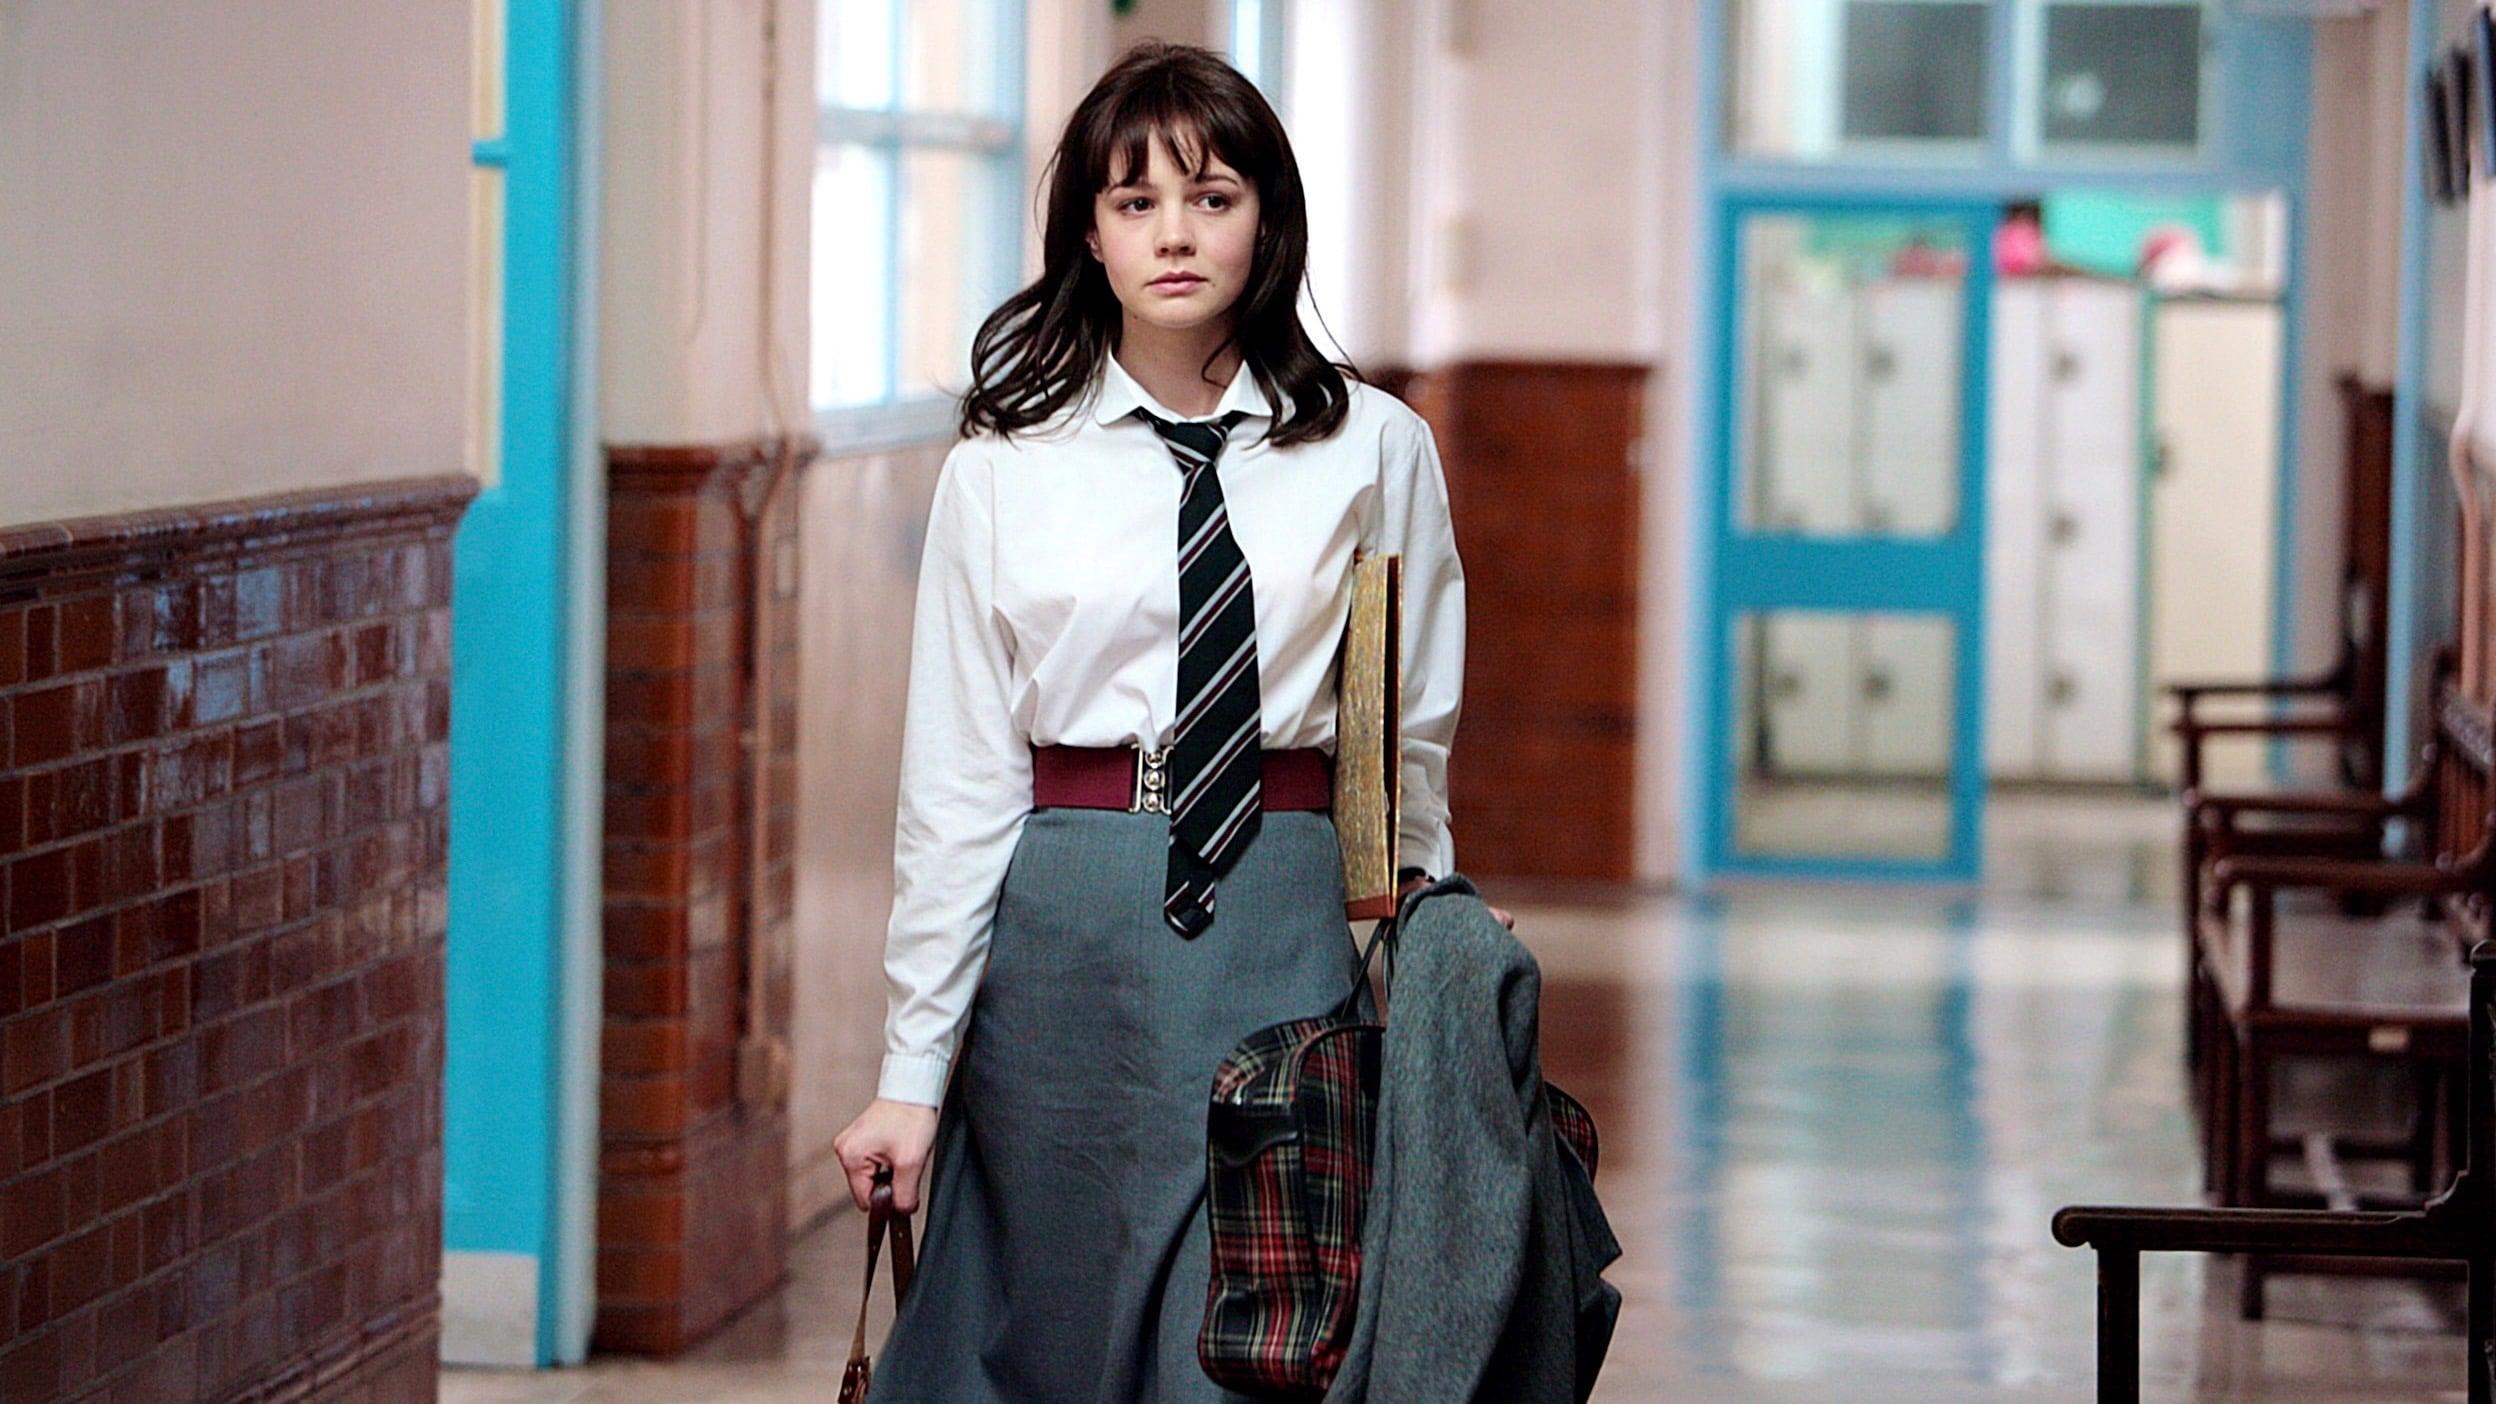 movie-girls-school-old-man-teen-girl-sex